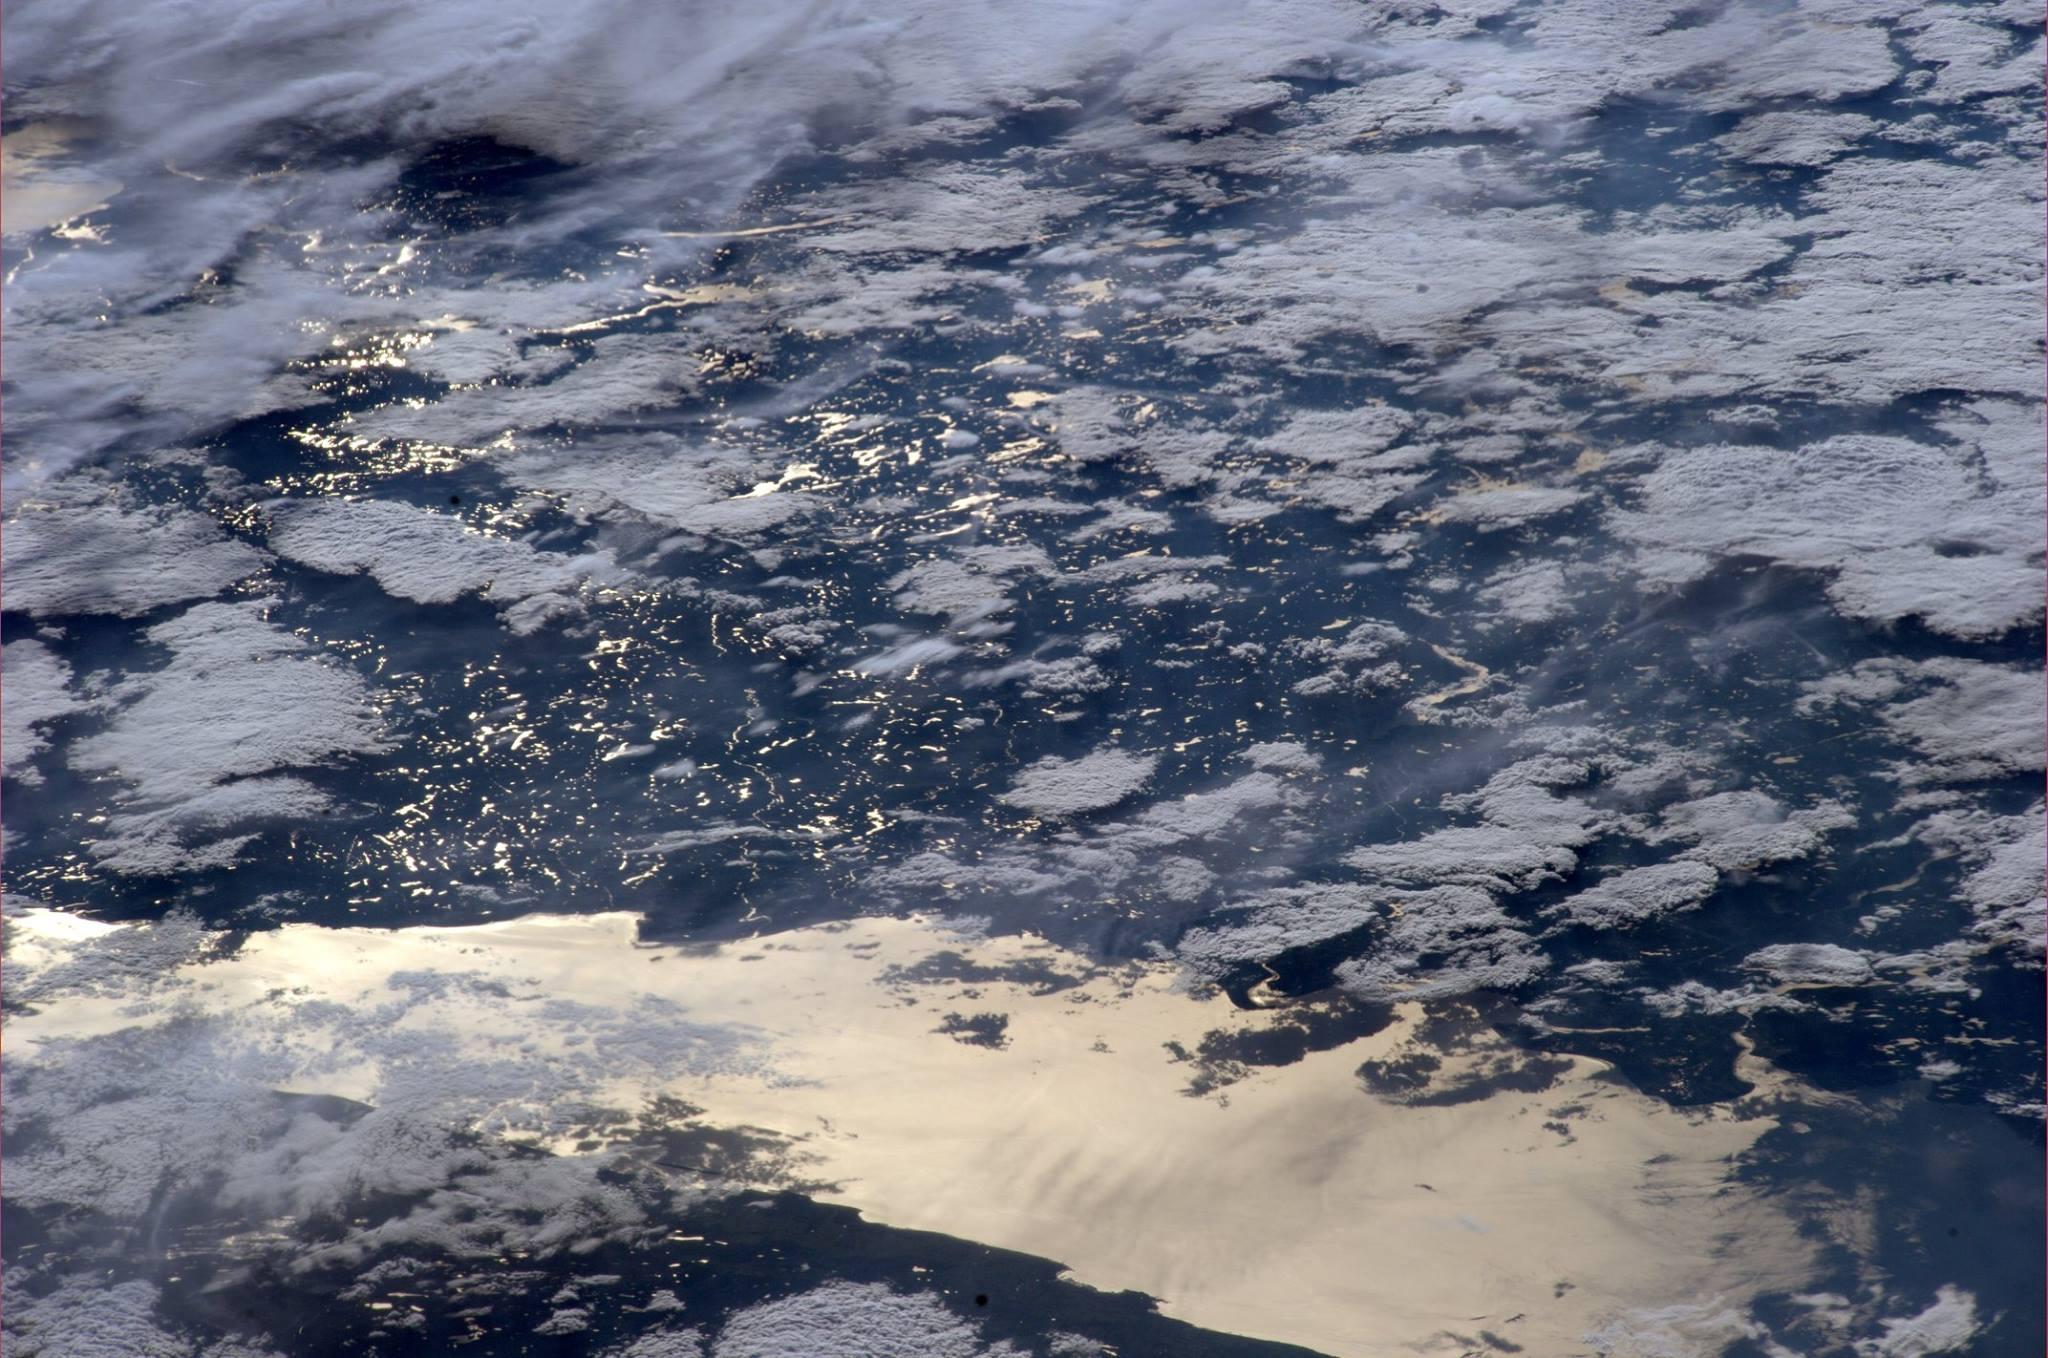 Photos astronaut Alexander Gerst 03